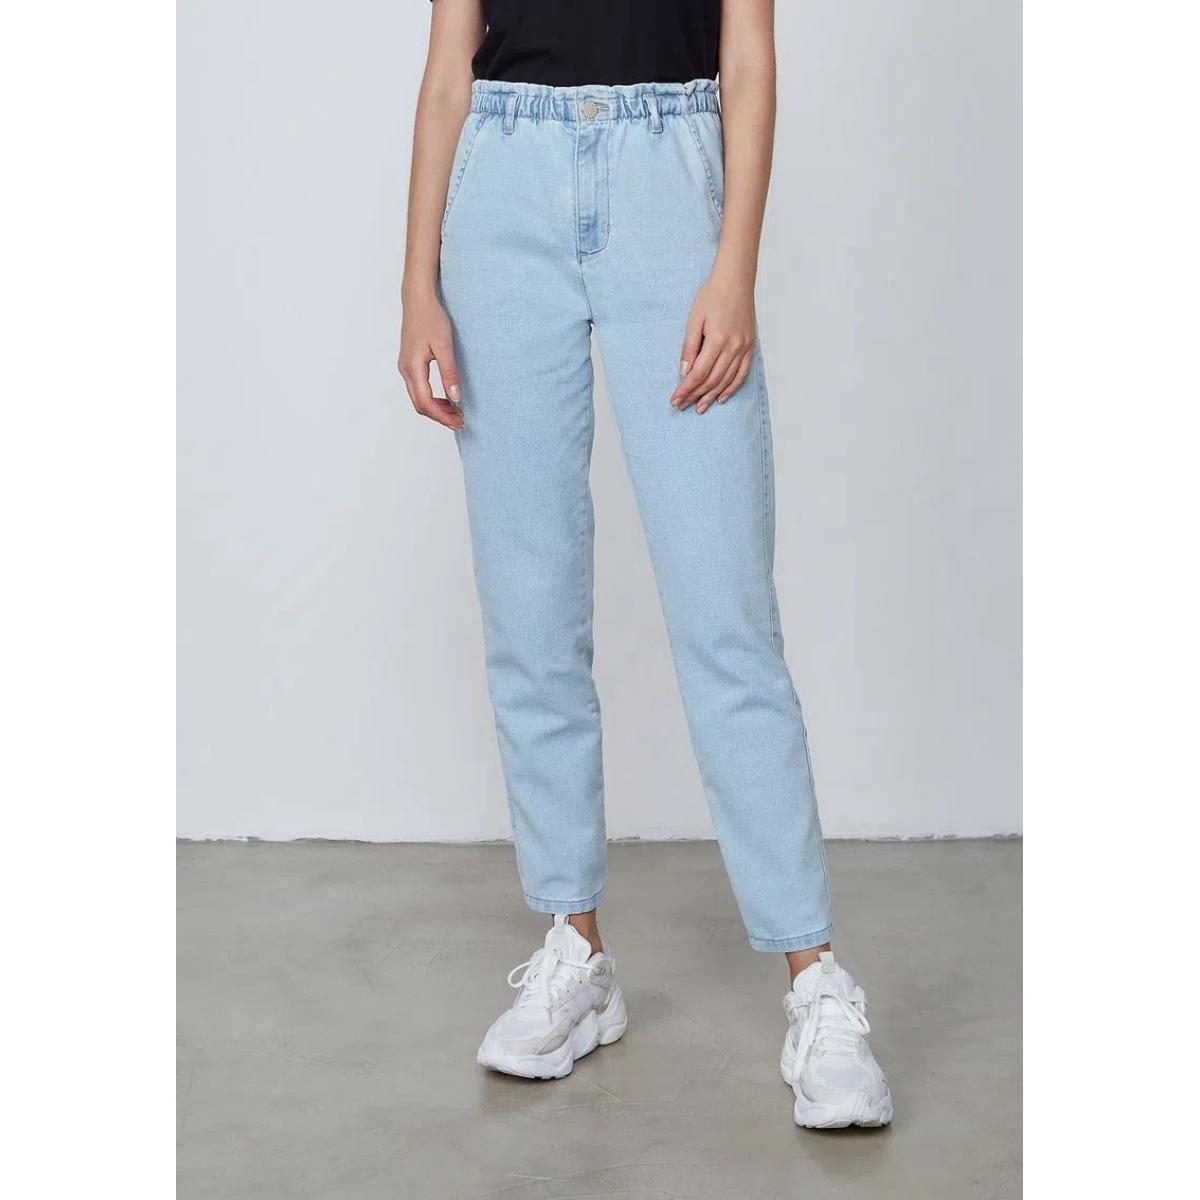 Calça Feminina Dzarm Zu78 1bsn Jeans Claro